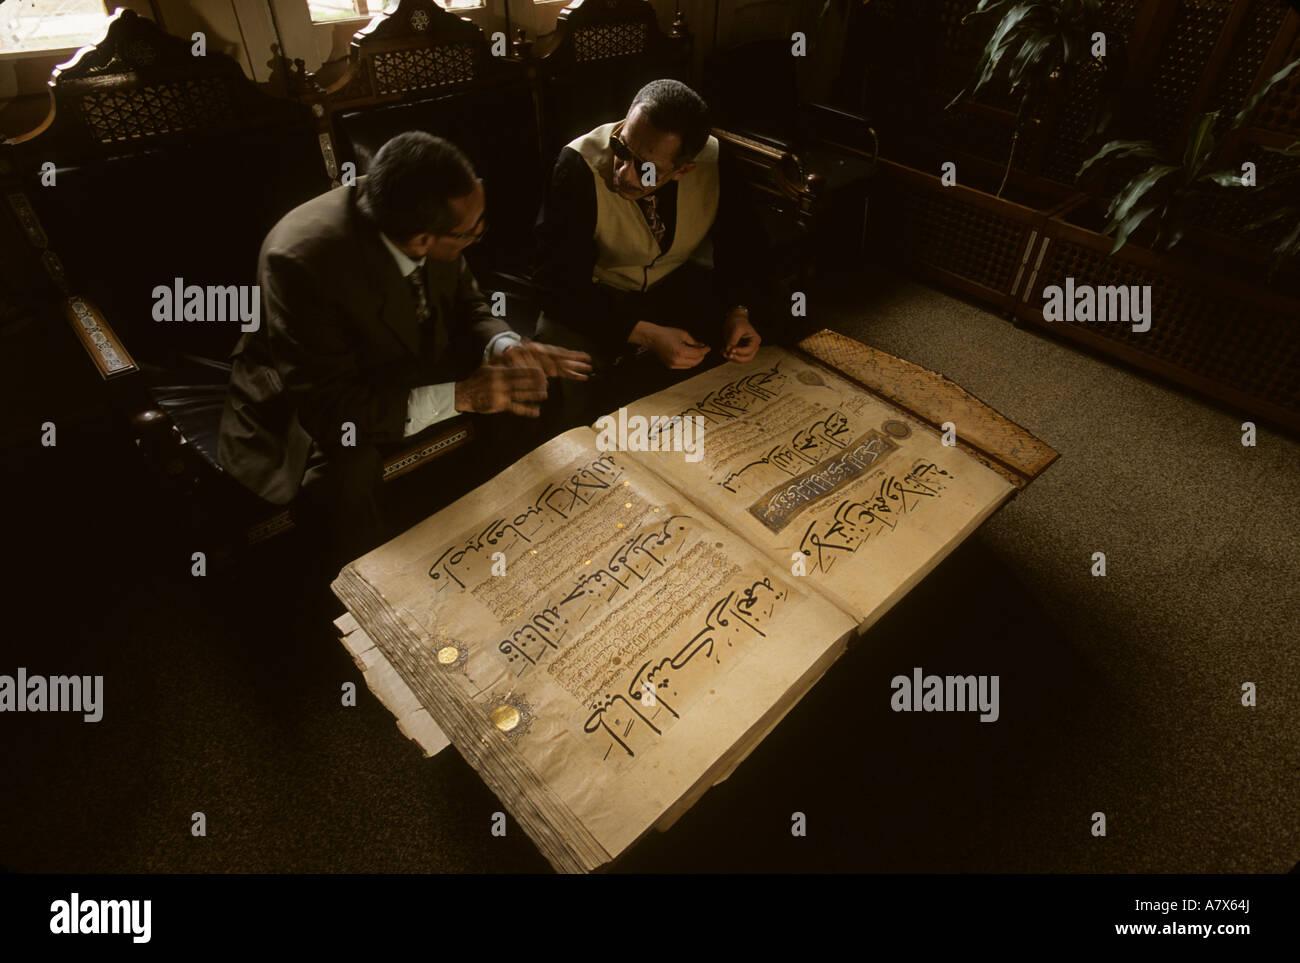 Egypt, Al Azhar Library, detail of 13th century Koran - Stock Image